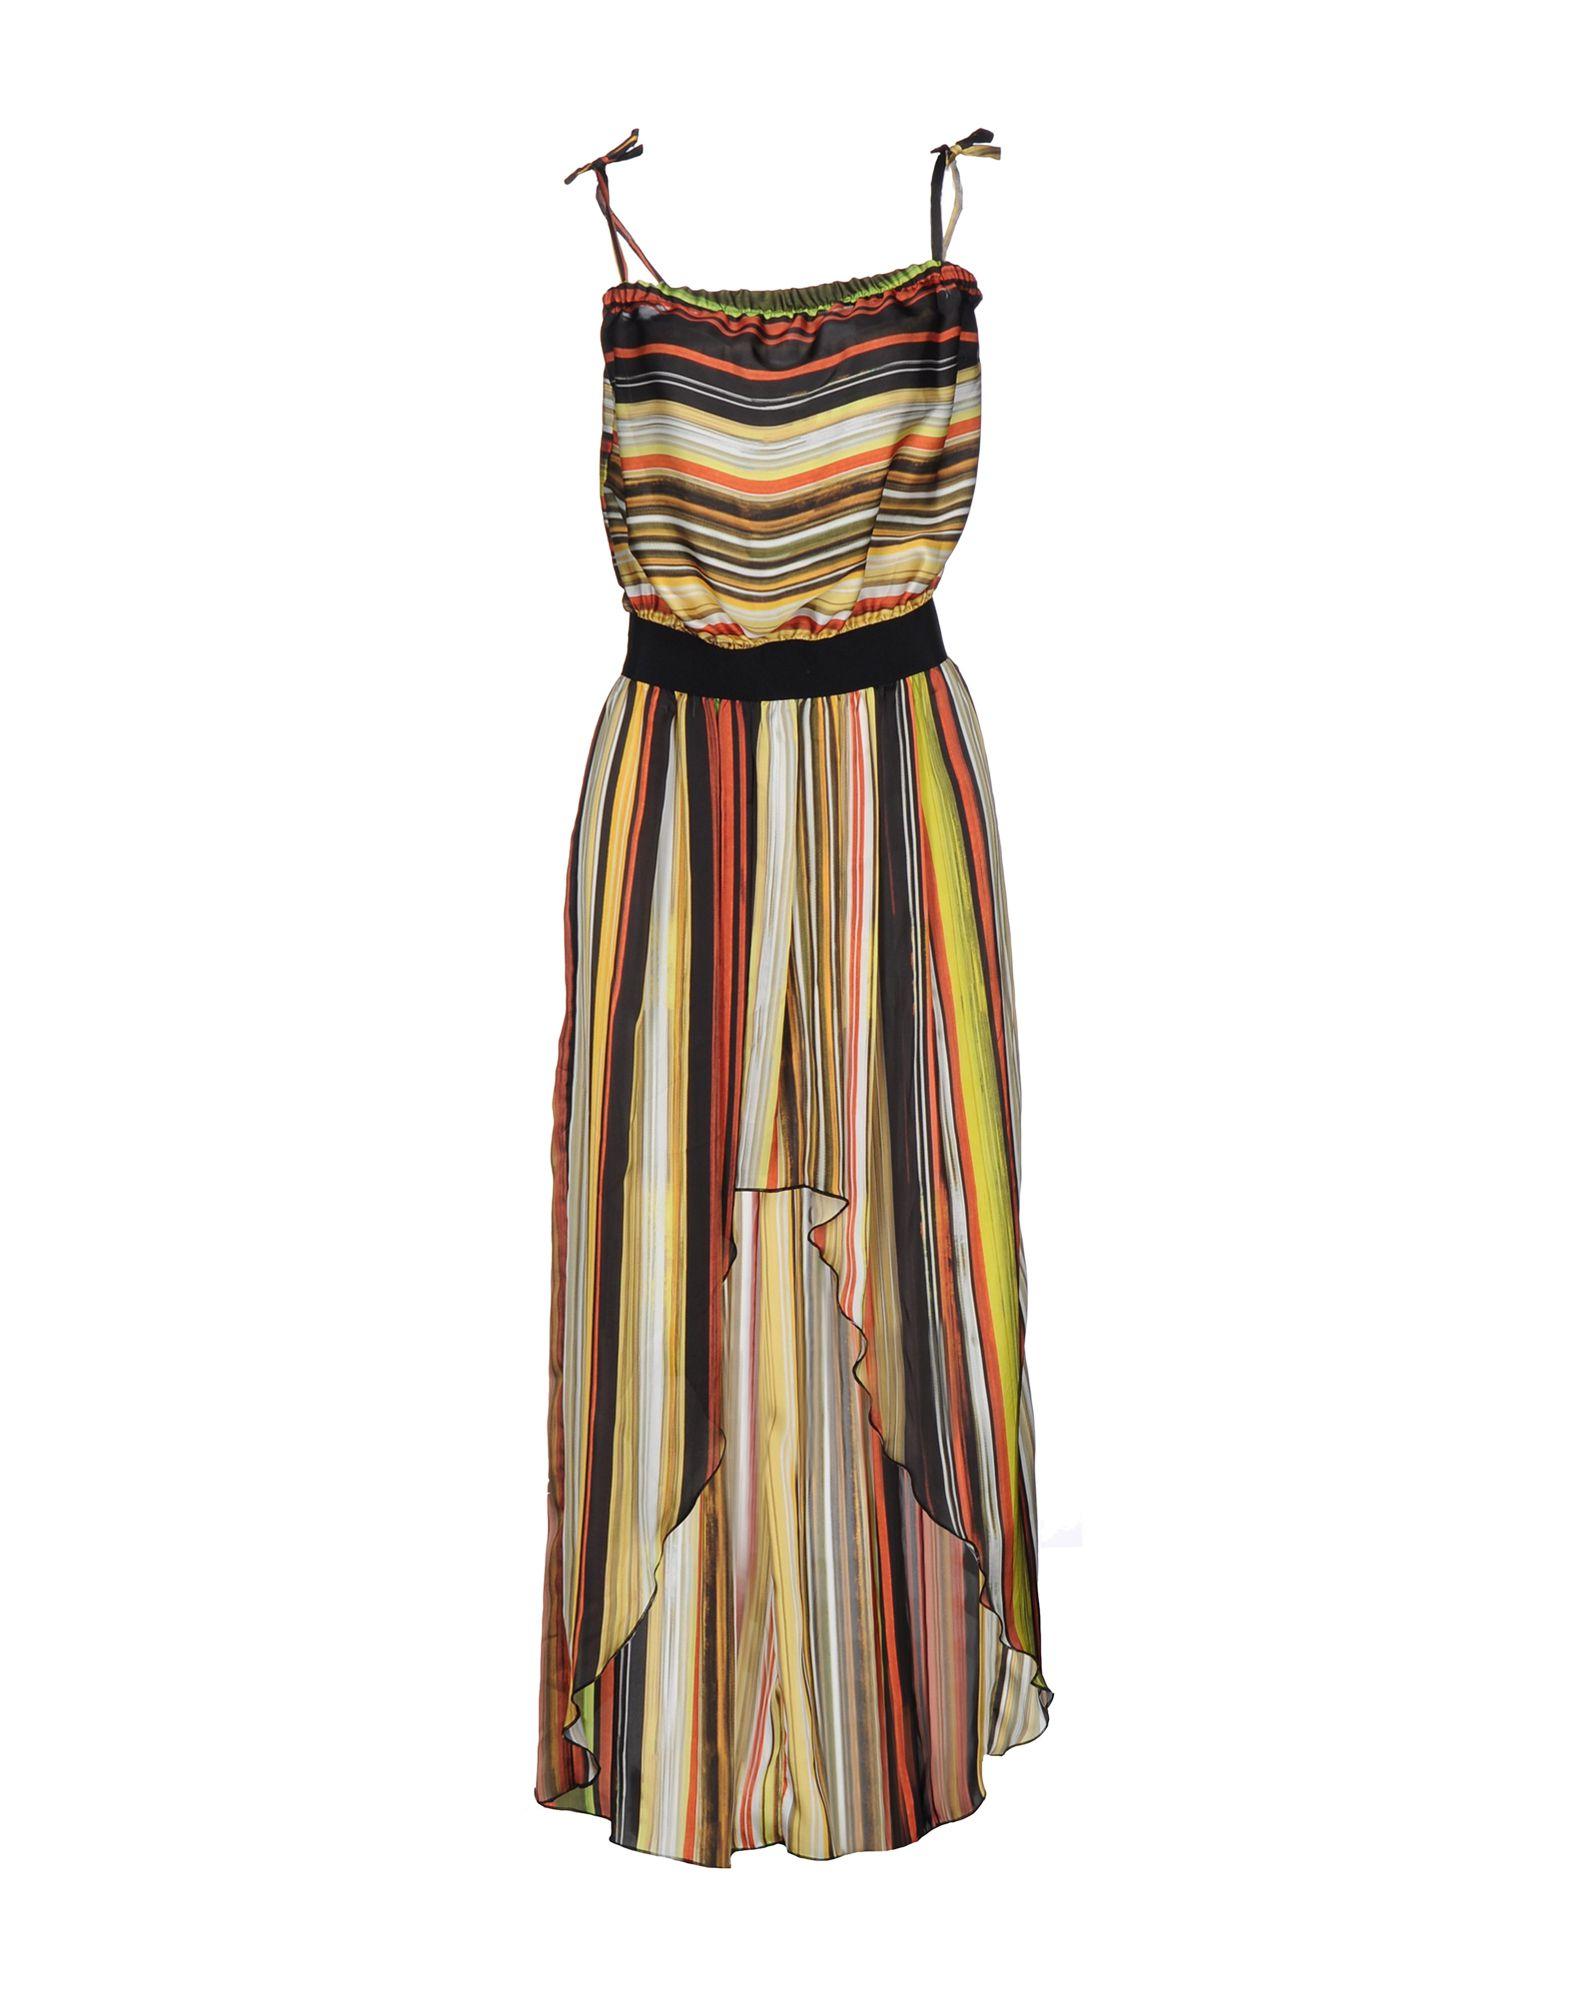 REBEKA ROSS Damen Kurzes Kleid Farbe Gelb Größe 5